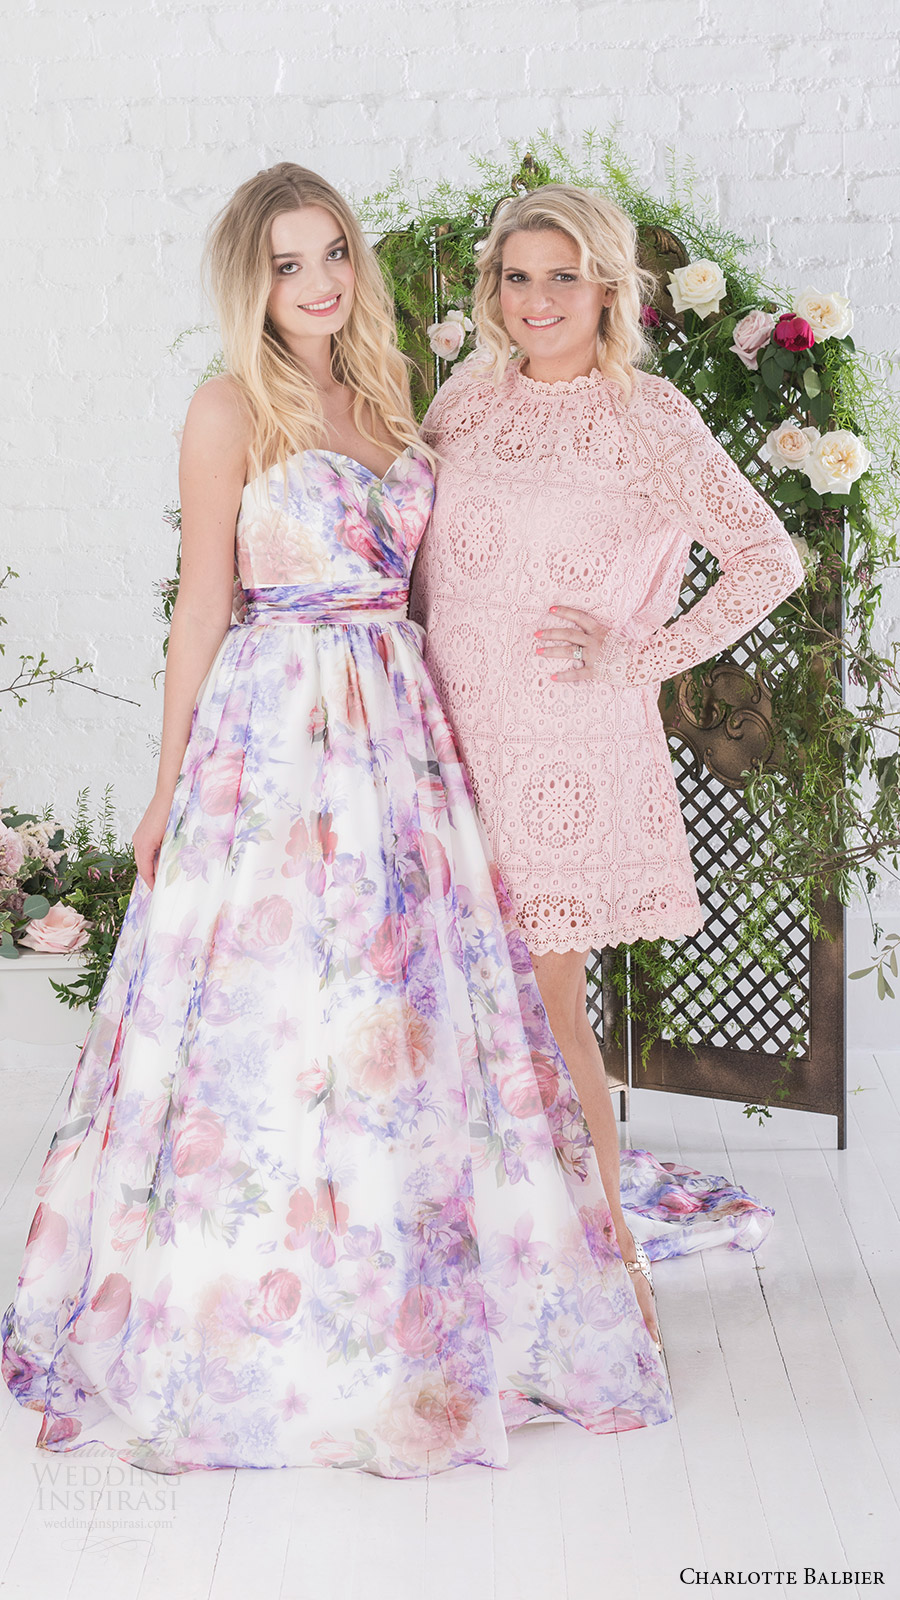 charlotte balbier bridal 2017 strapless sweetheart ball gown wedding dress (bloom) fv  floral print pockets designer